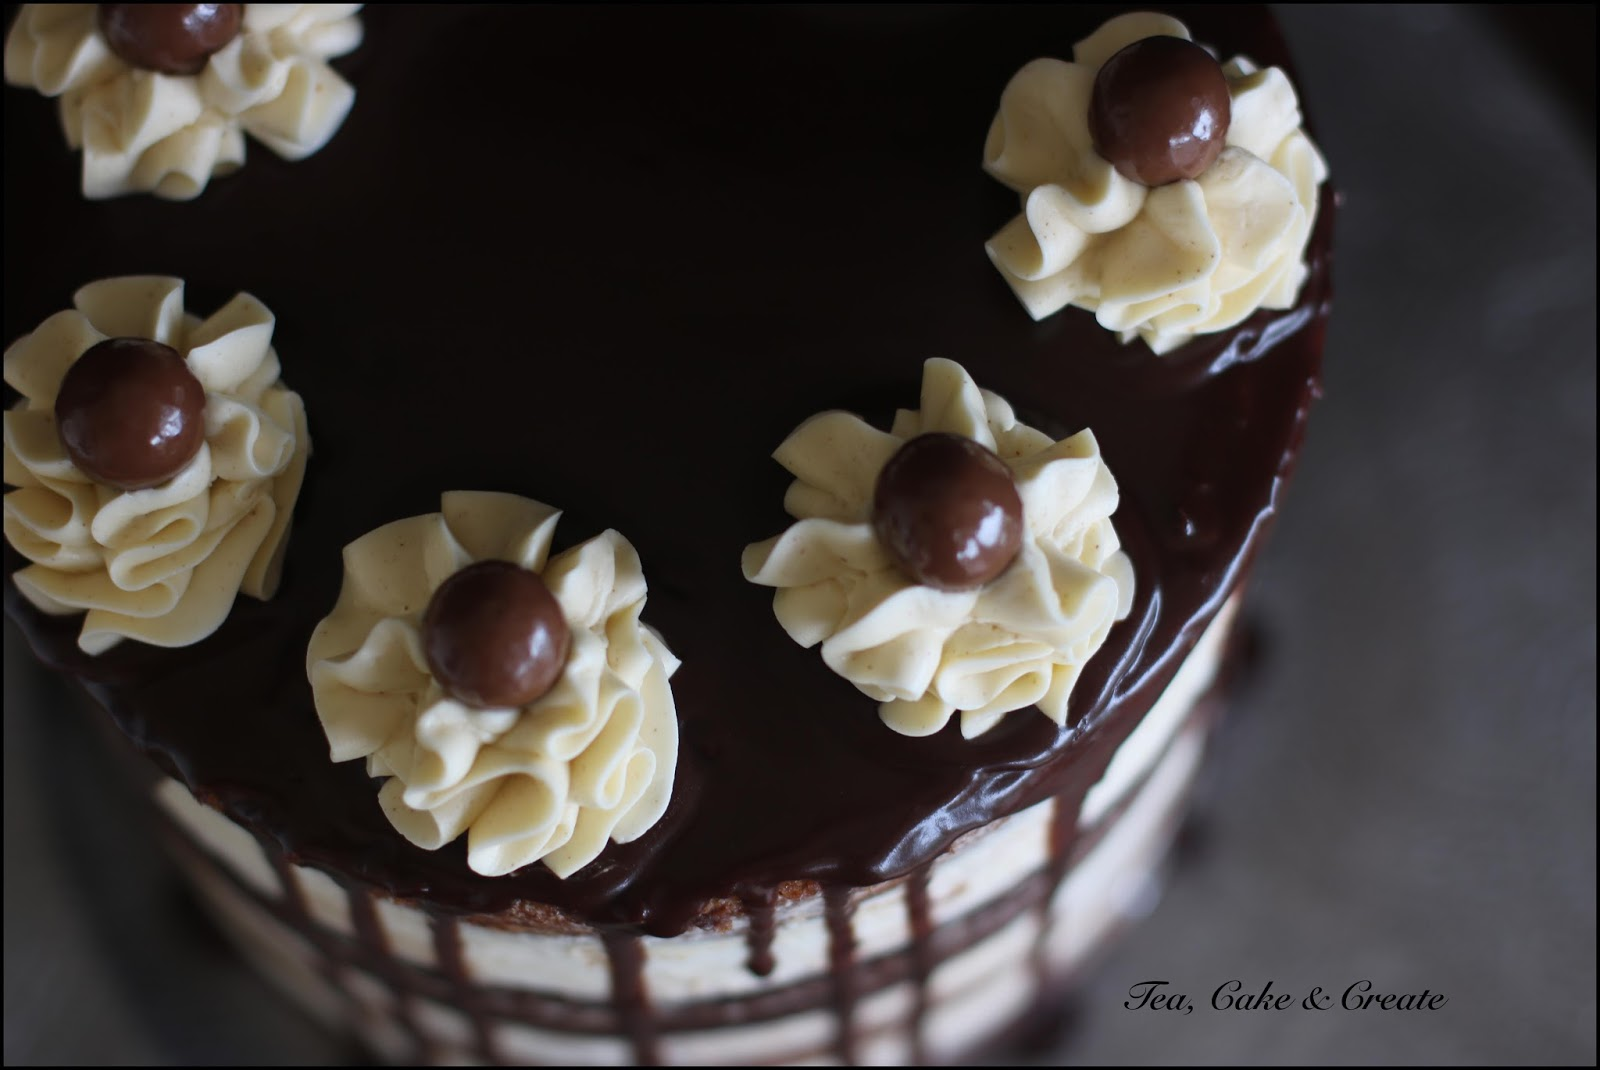 tea cake u0026 create